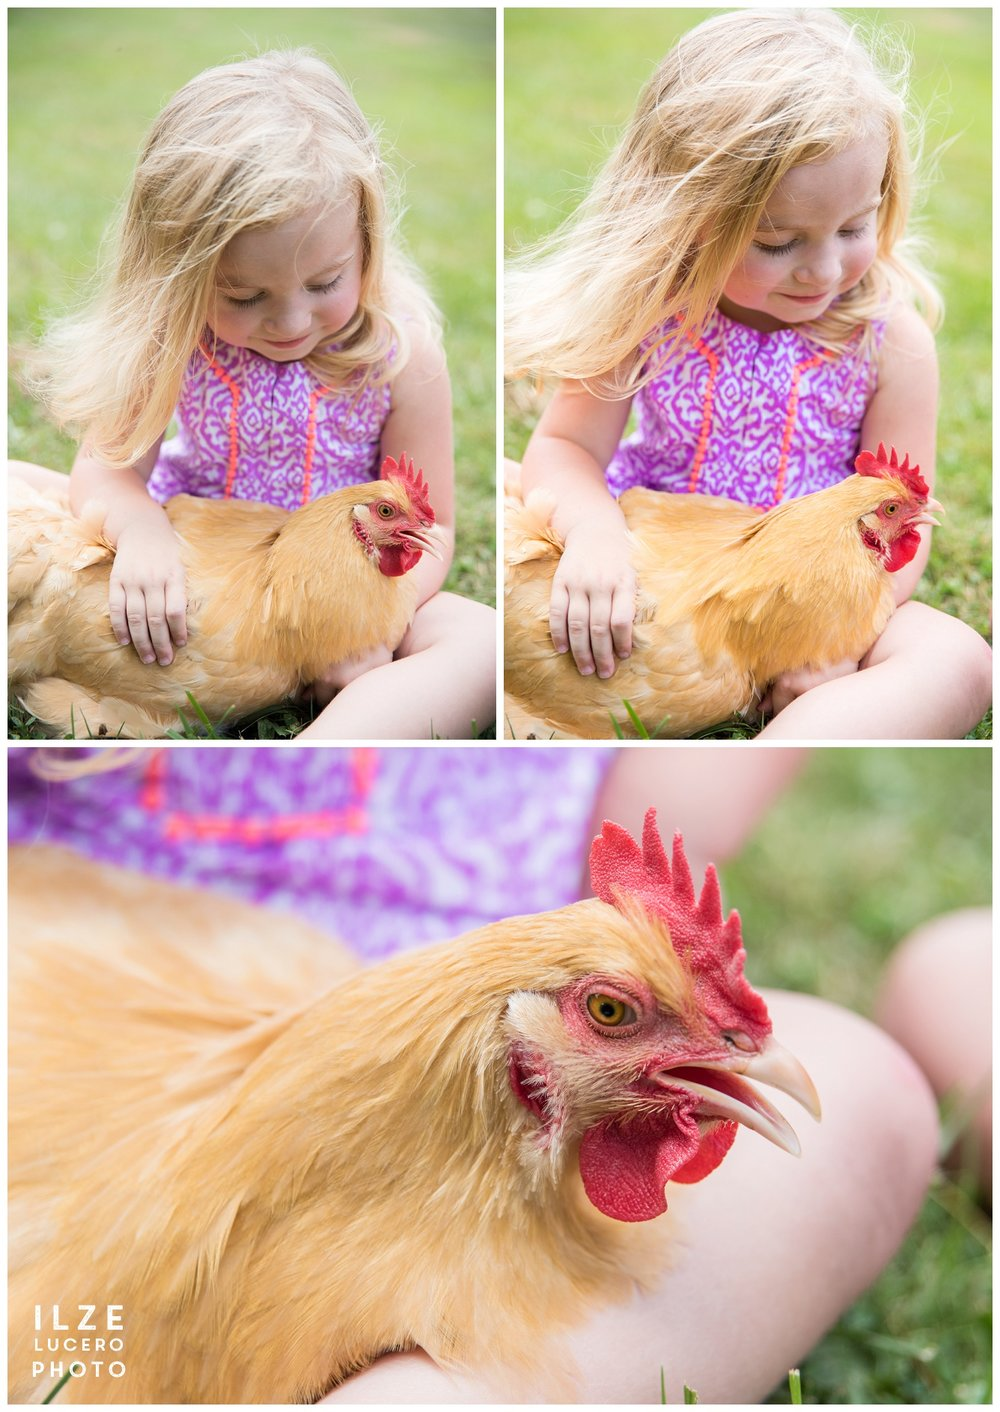 Girl and hen beautiful photo inspiration